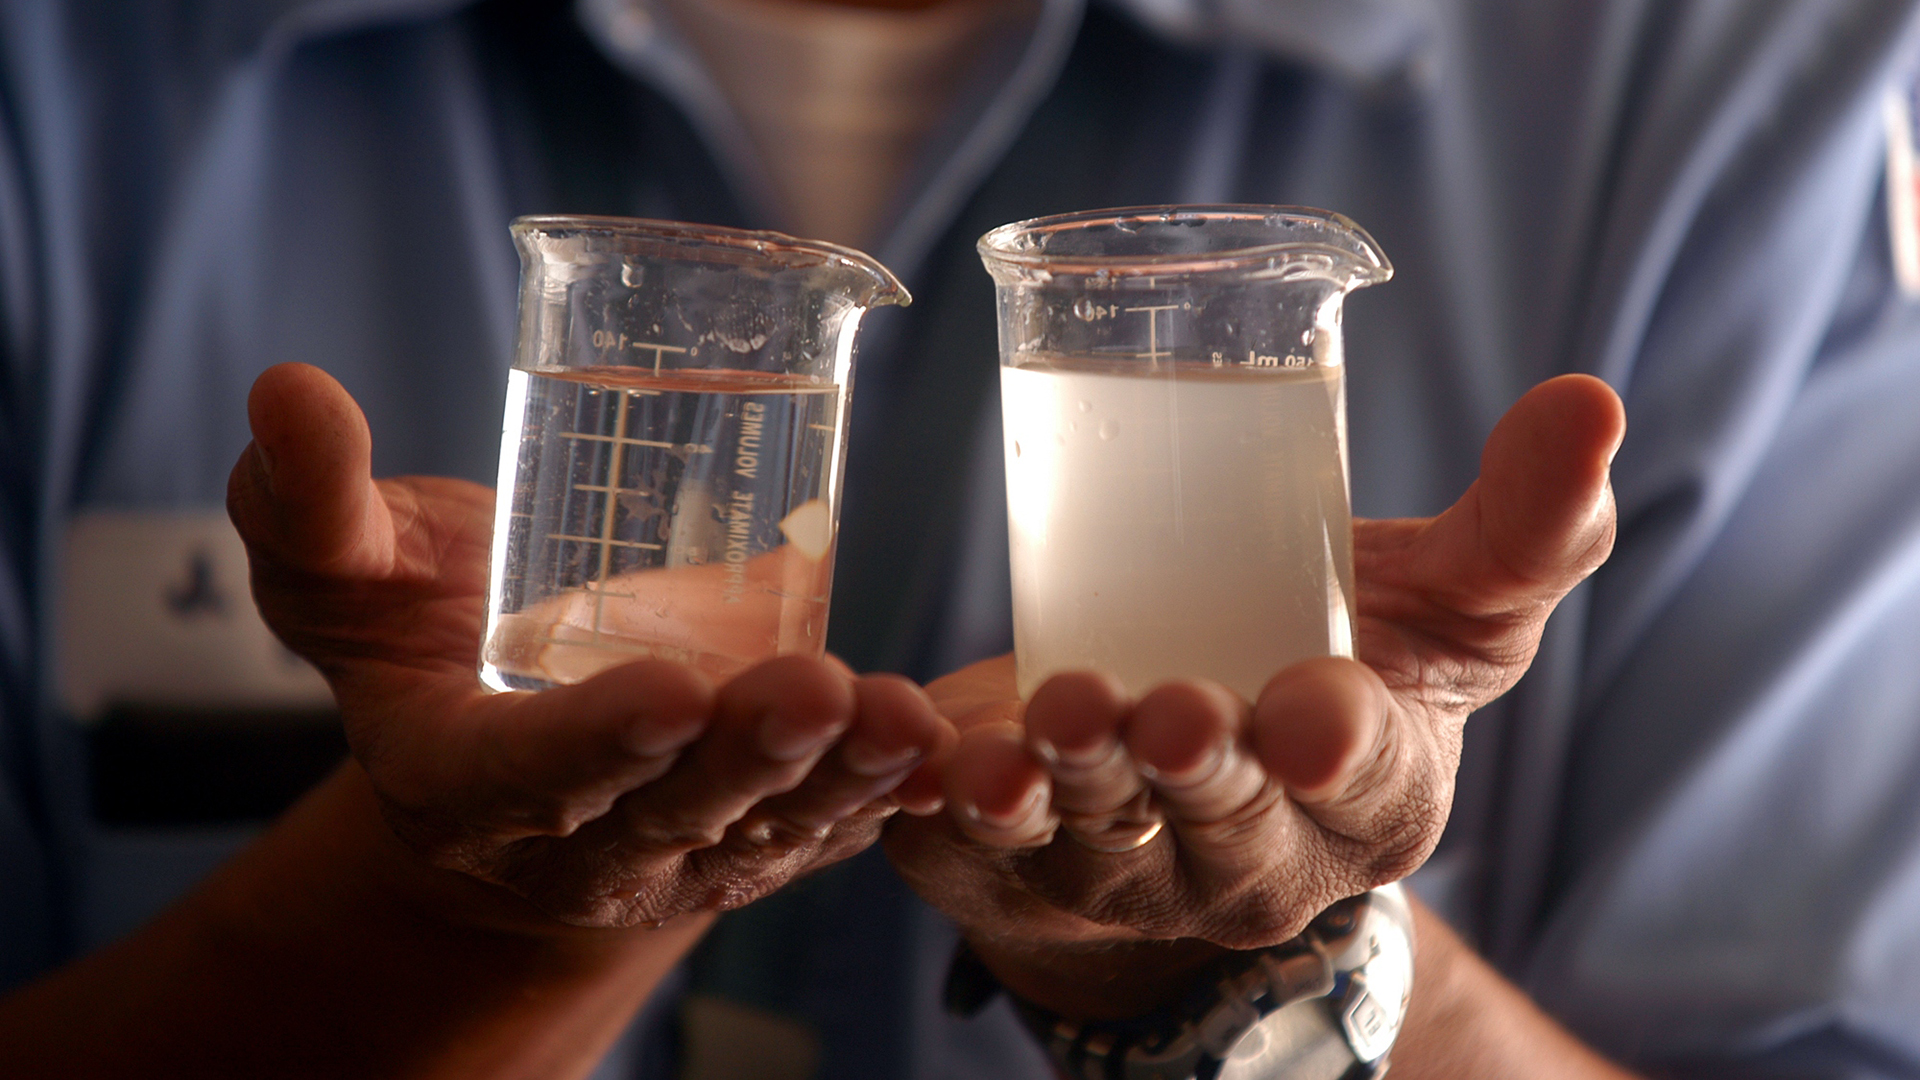 how to make seamonkey water